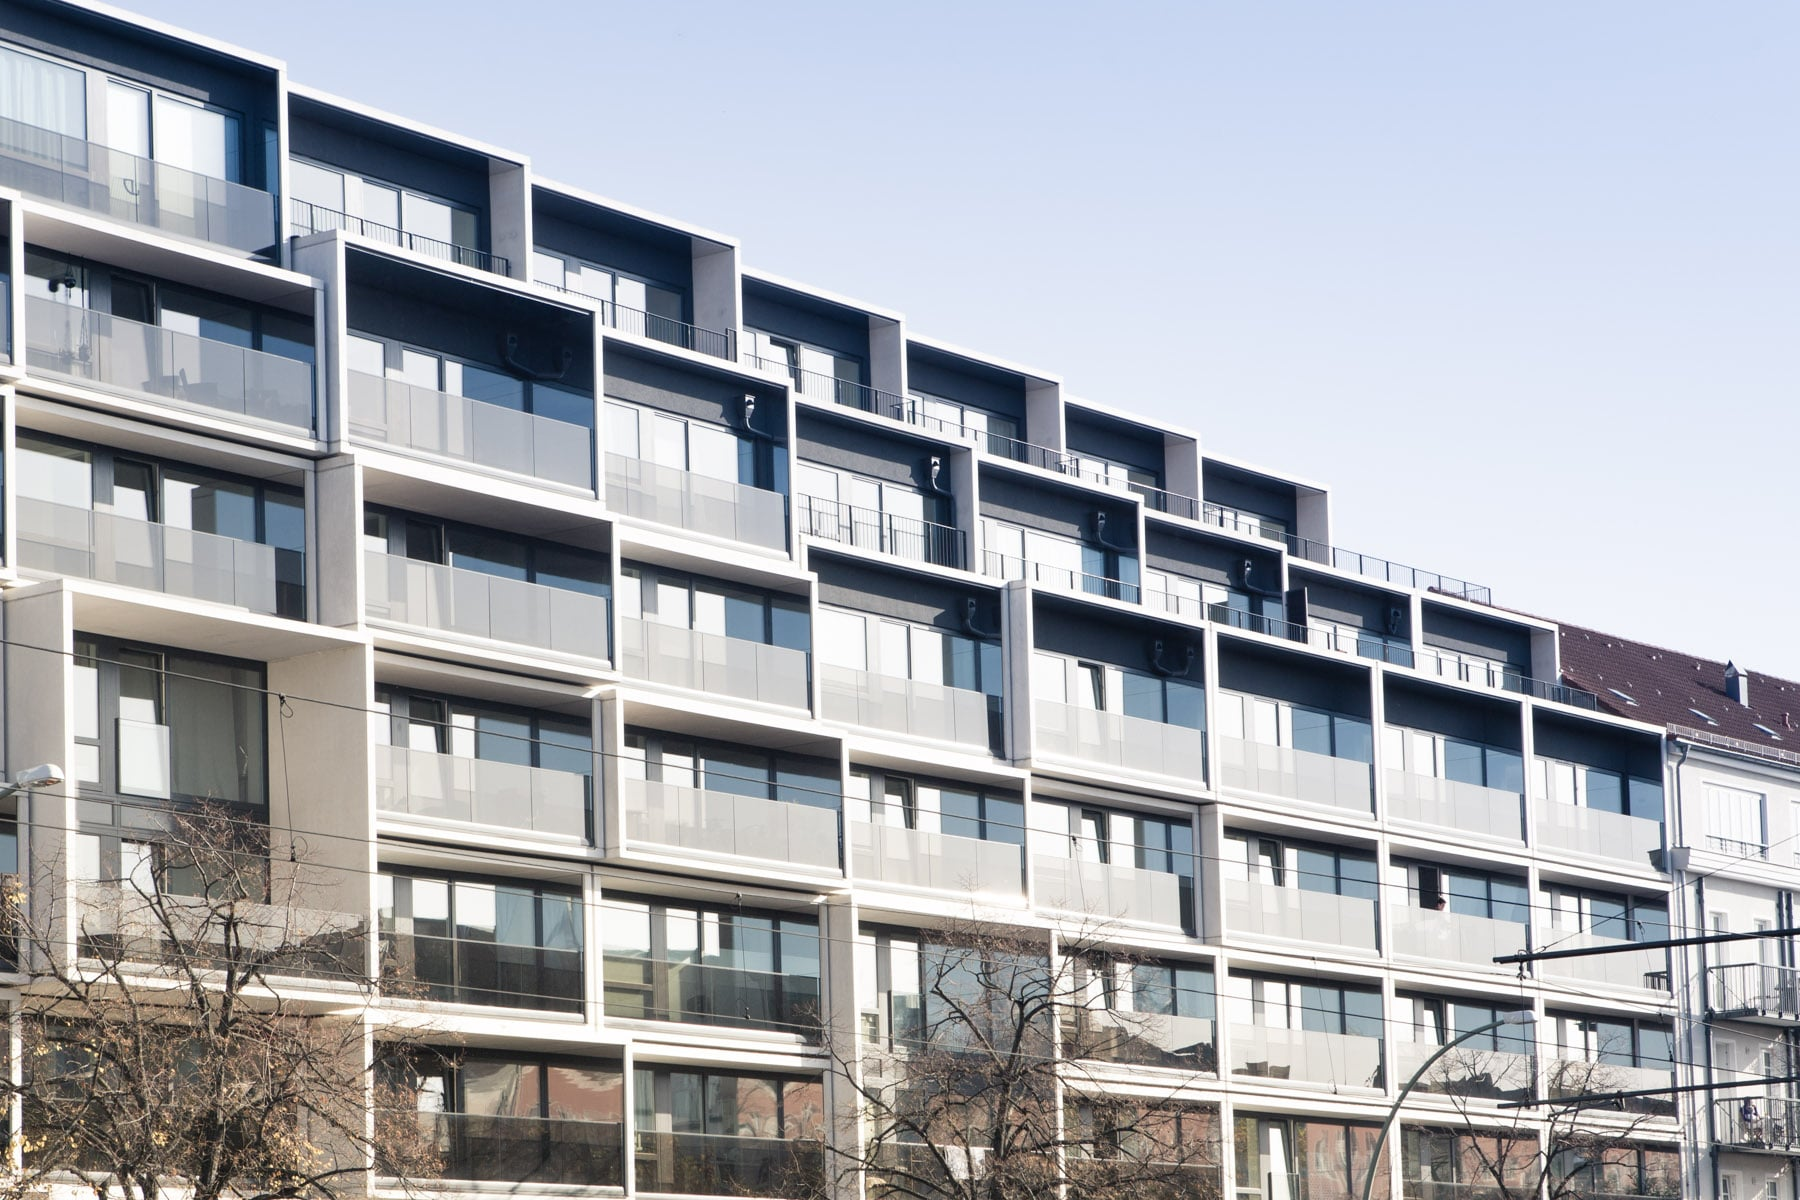 Wohnhaus, Prenzlauer Berg, berlin